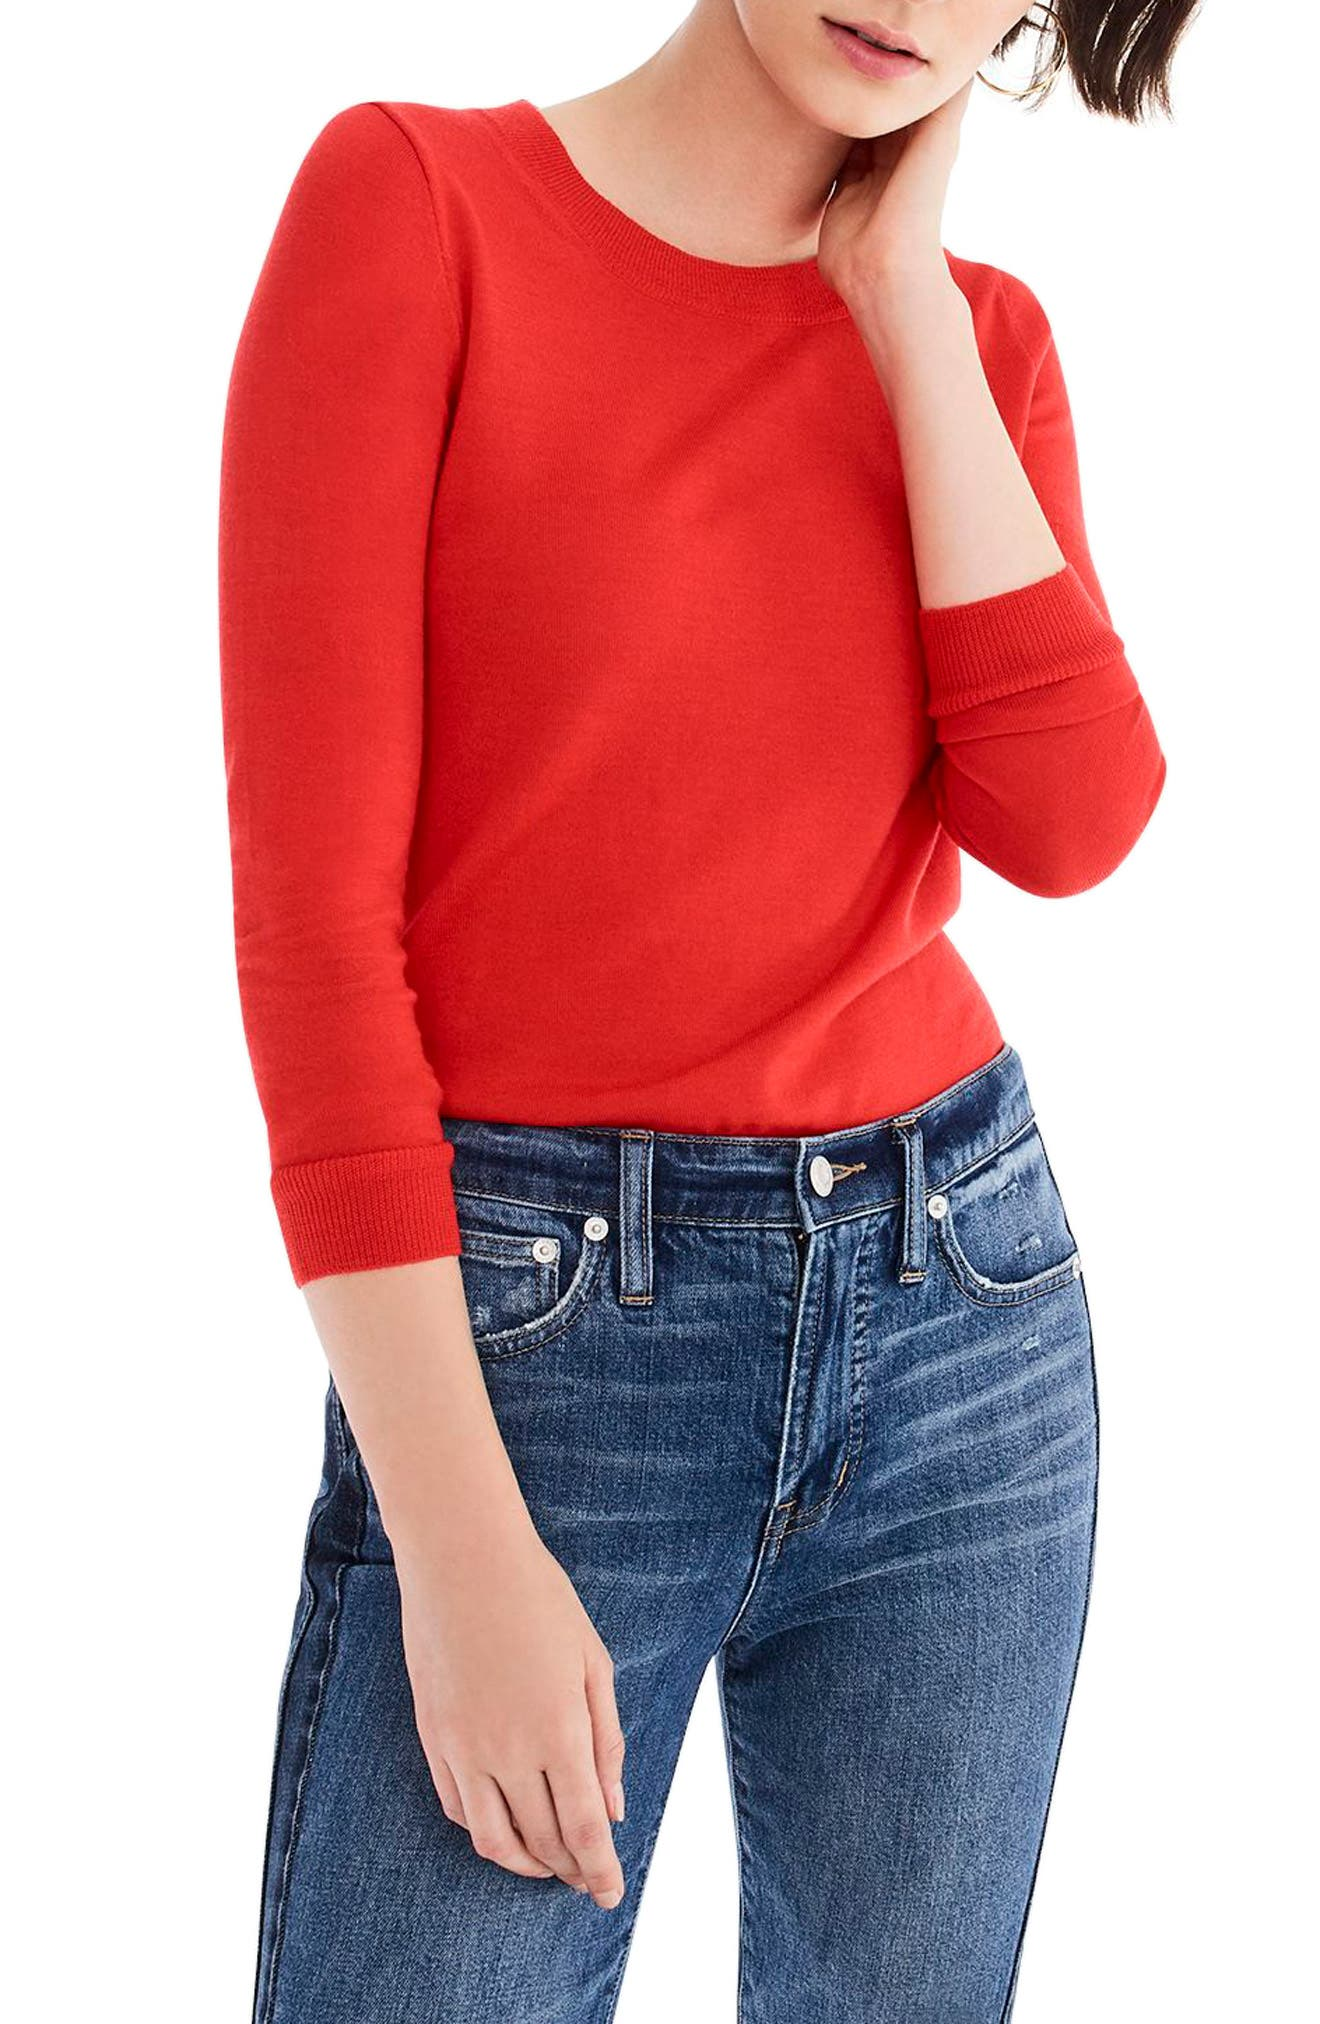 J.crew Tippi Merino Wool Sweater, Red